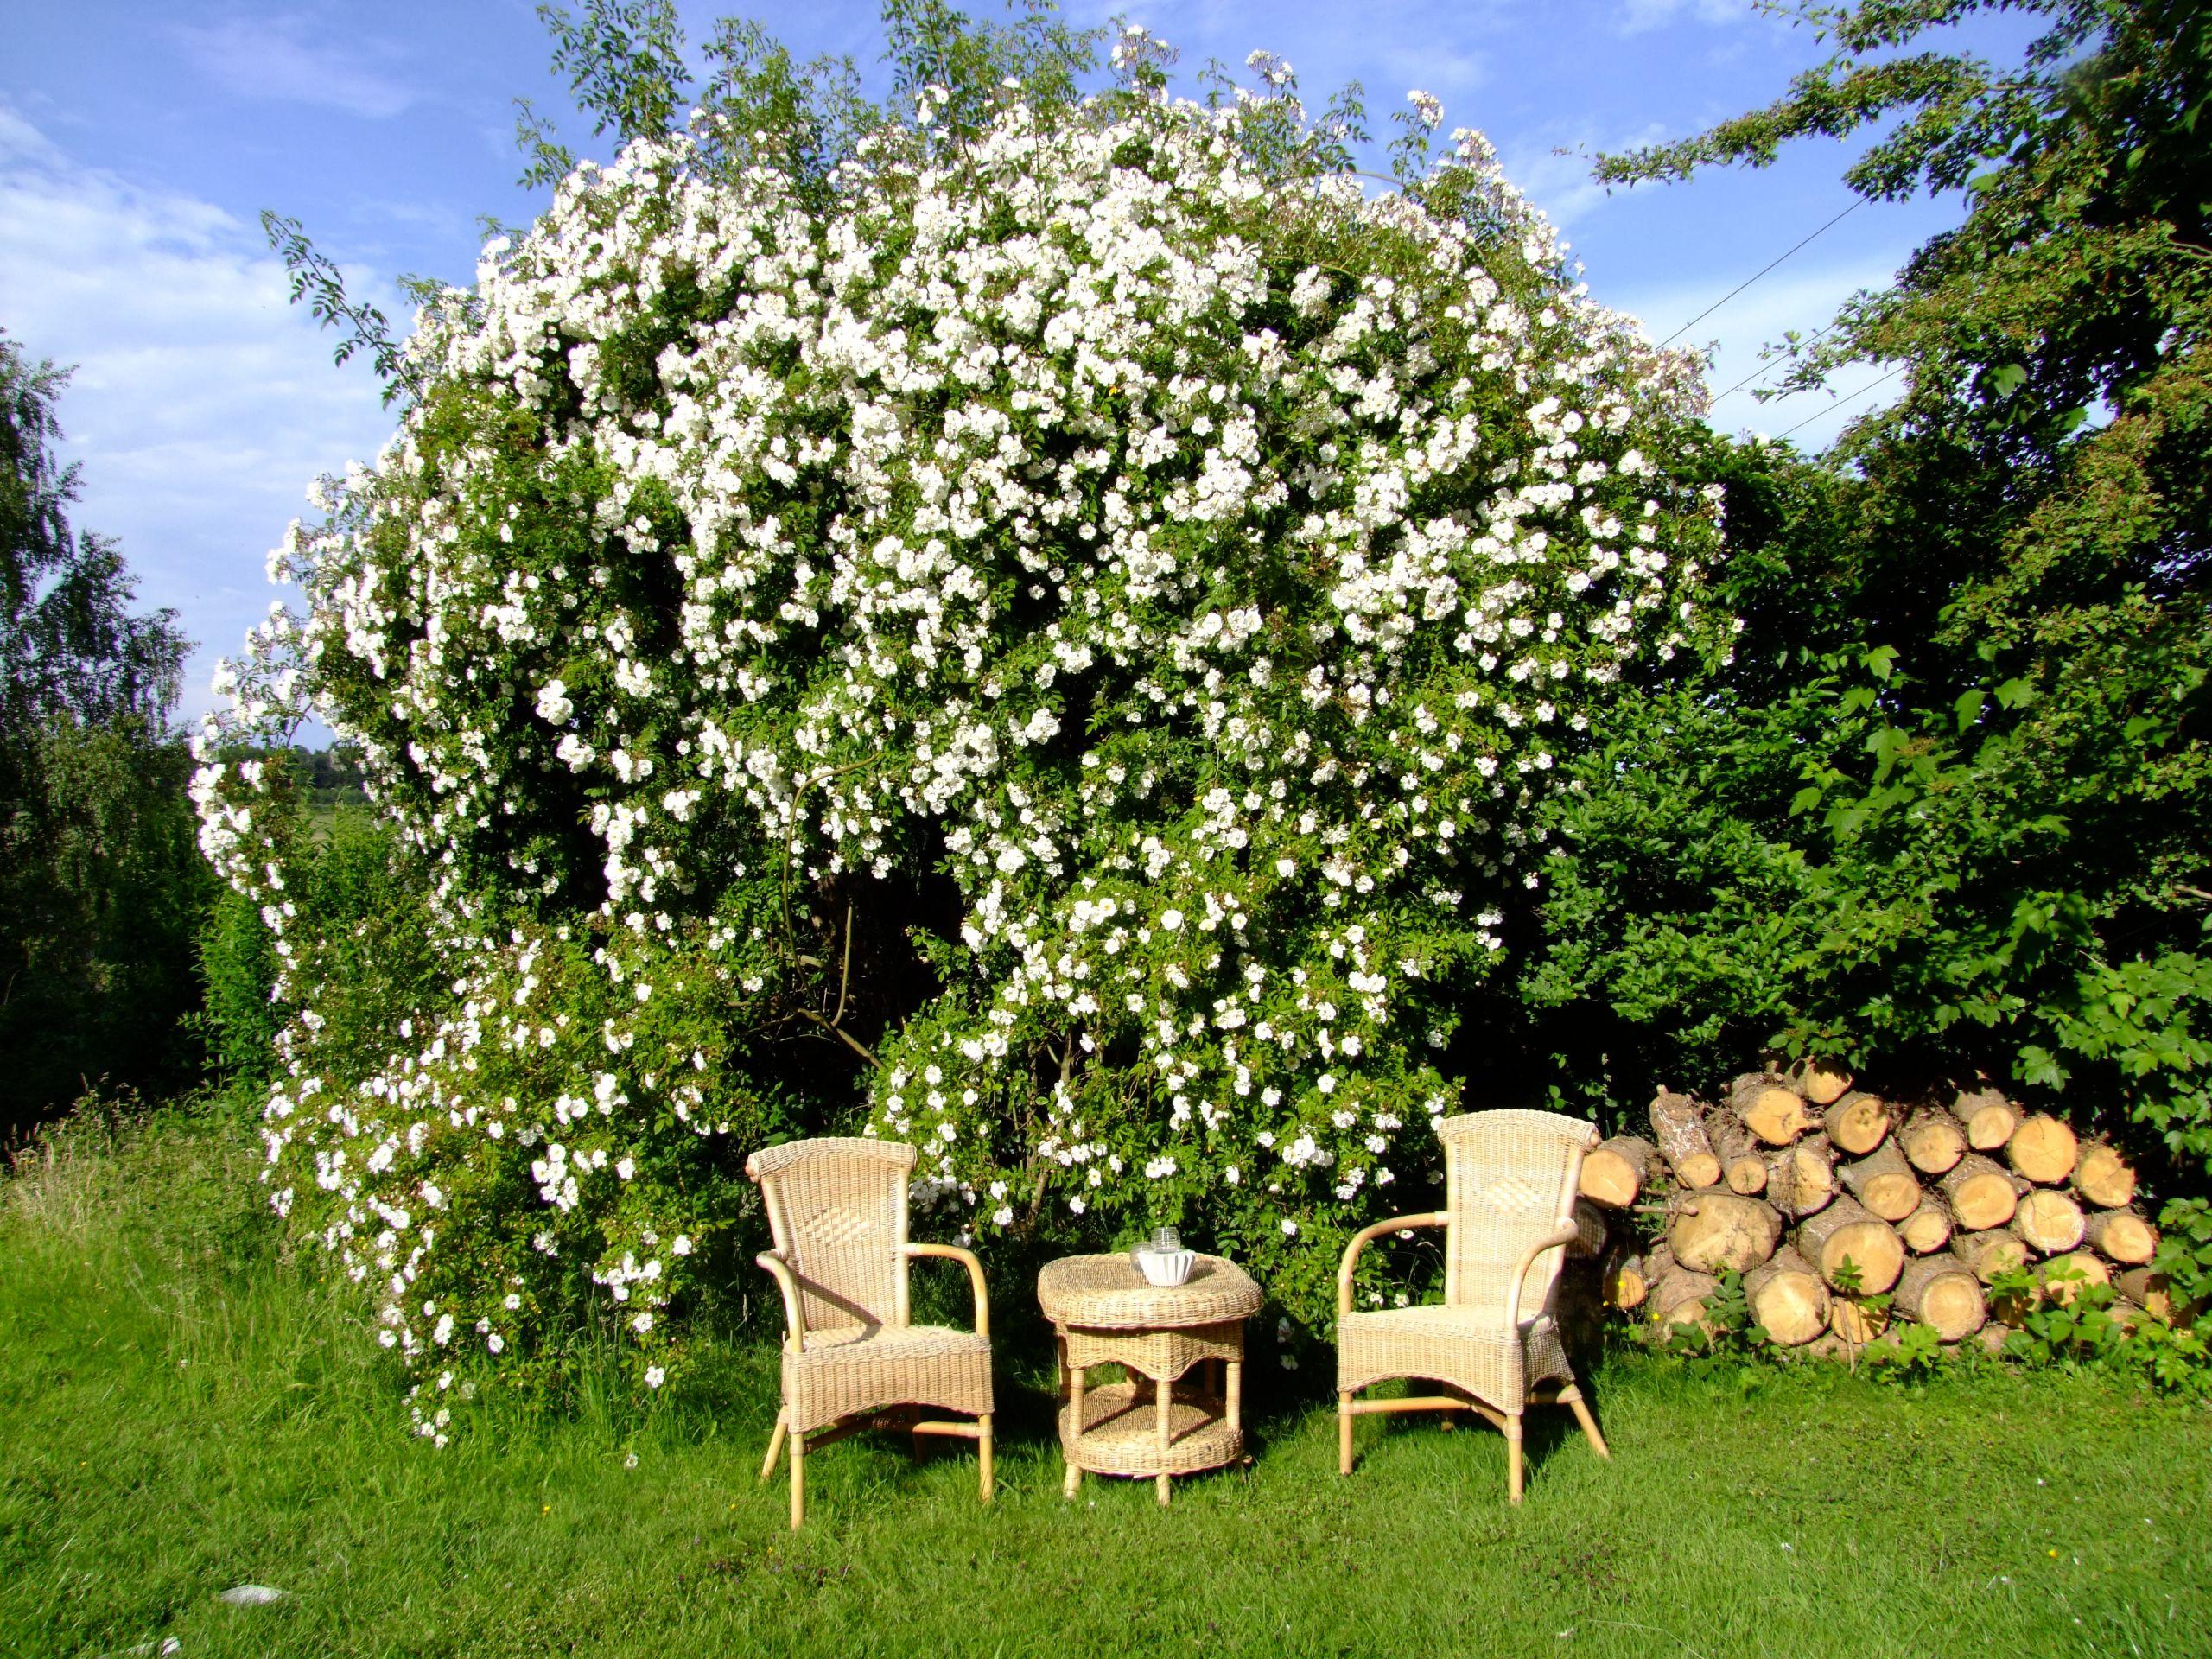 garten sitzecke gestalten ideen fr kleine groe grten zum fur den kreativ mosaikgarten lieblingsplatz